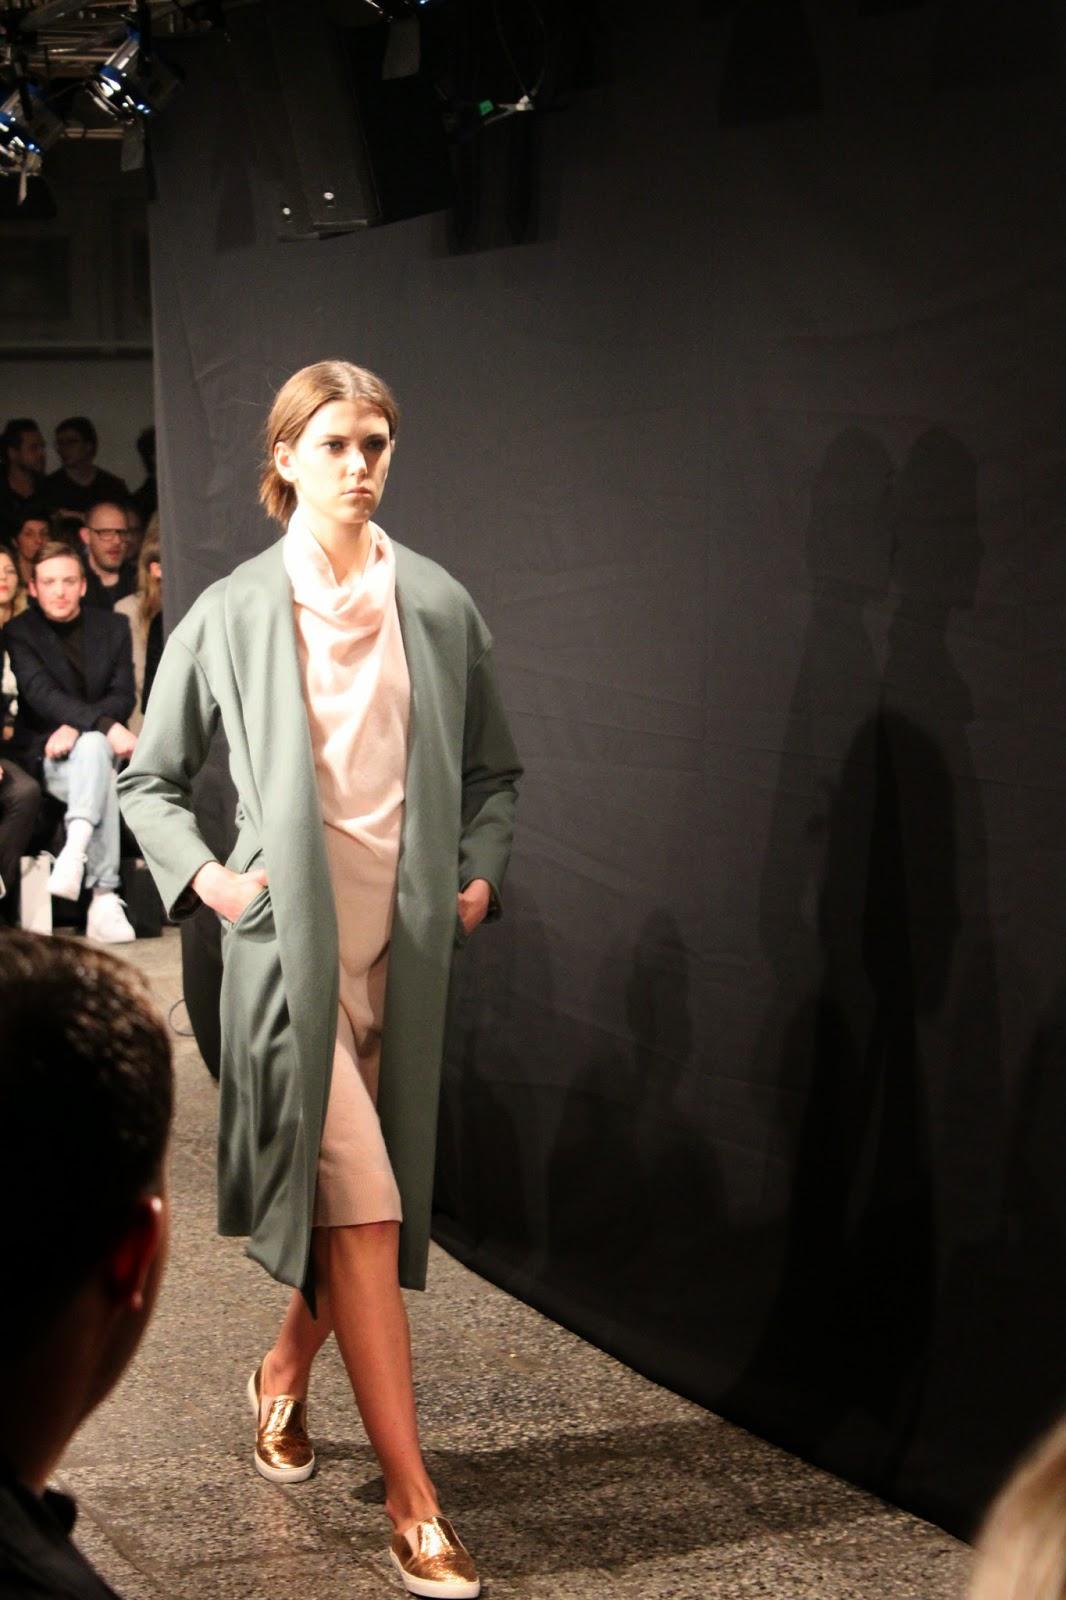 Mercedes Benz Fashionweek Berlin Part I_21